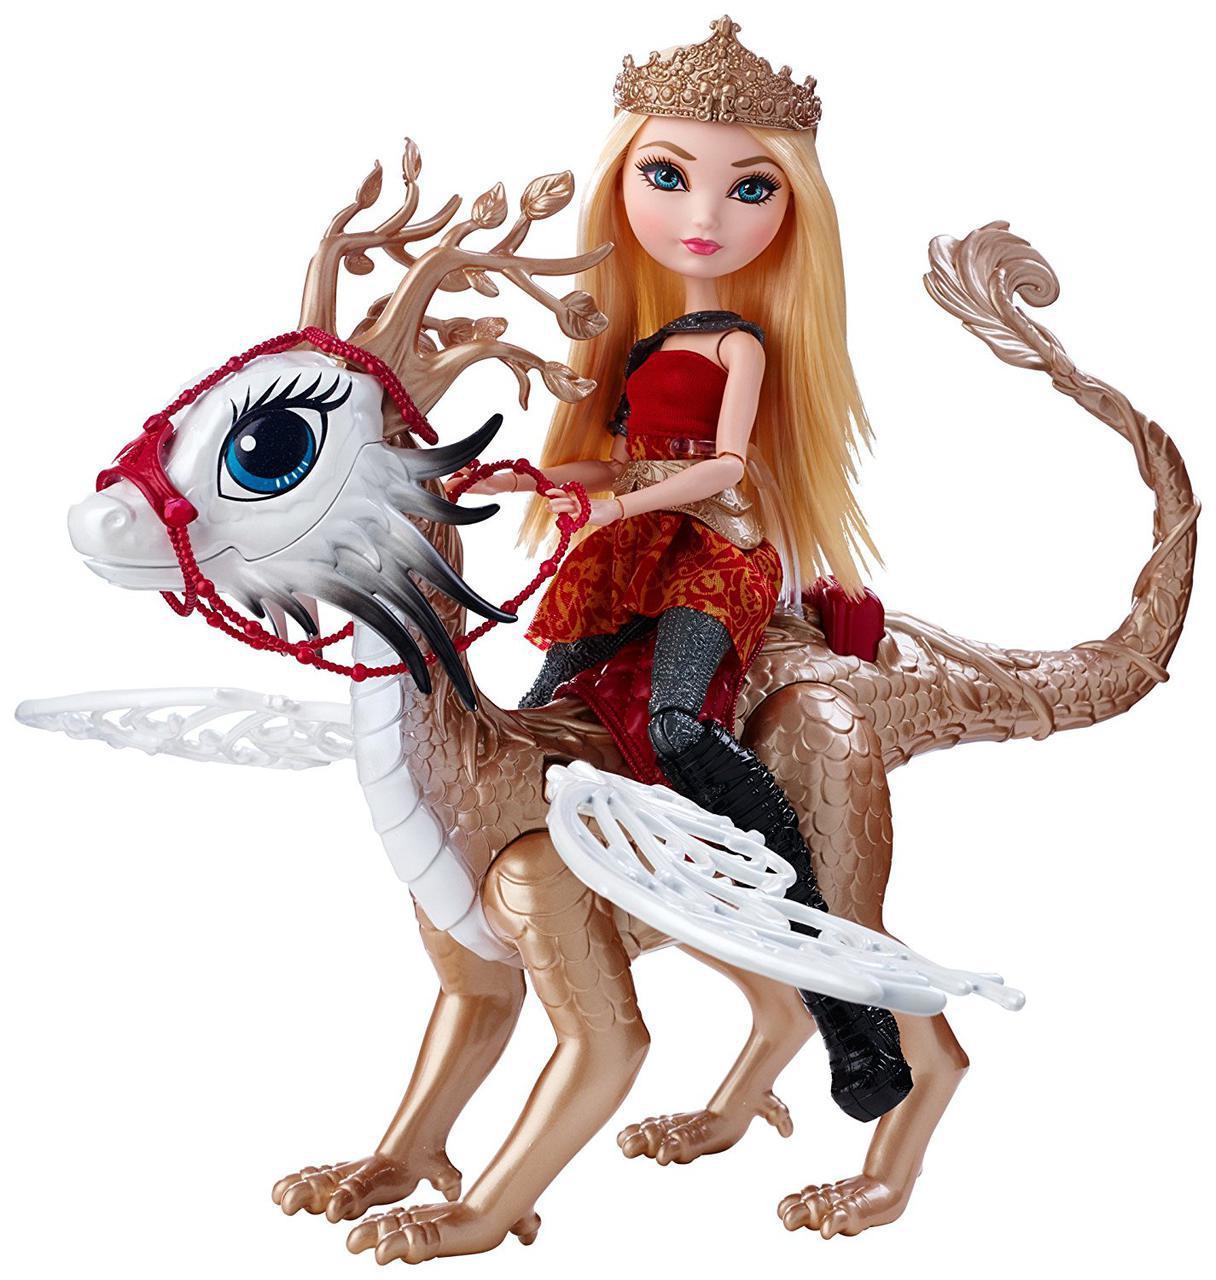 Набор Эппл Уайт и дракон Брэбёрн Ever After HighDragon Games Apple White Doll and Braebyrn Dragon